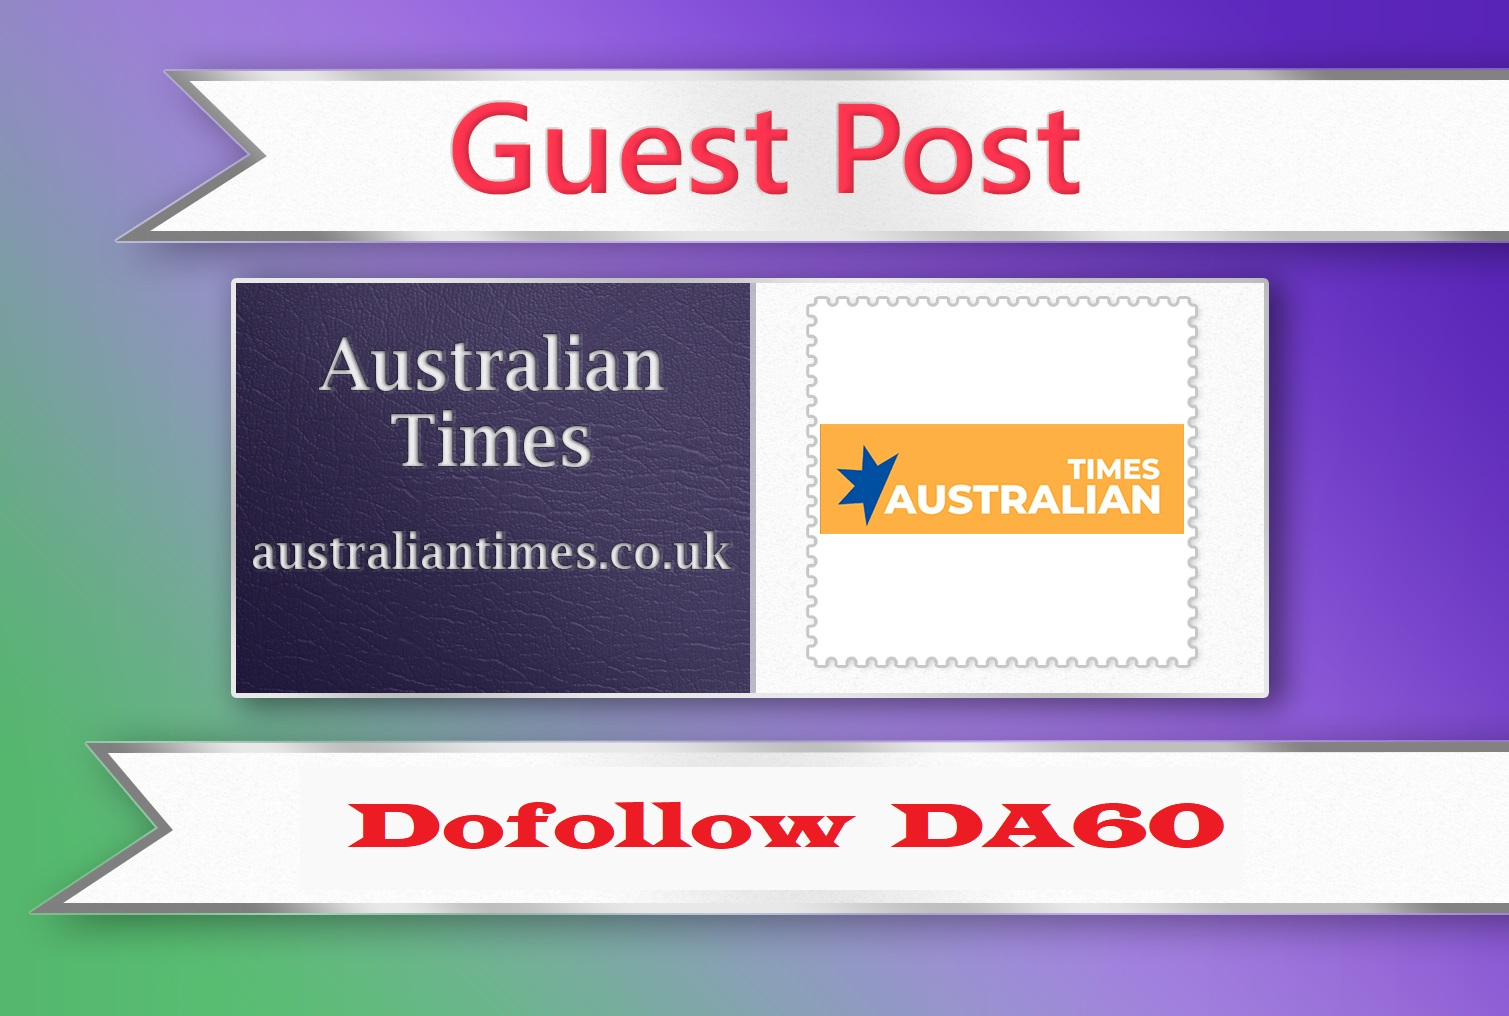 Guest post on Australian Times - australiantimes. co. uk - DA60